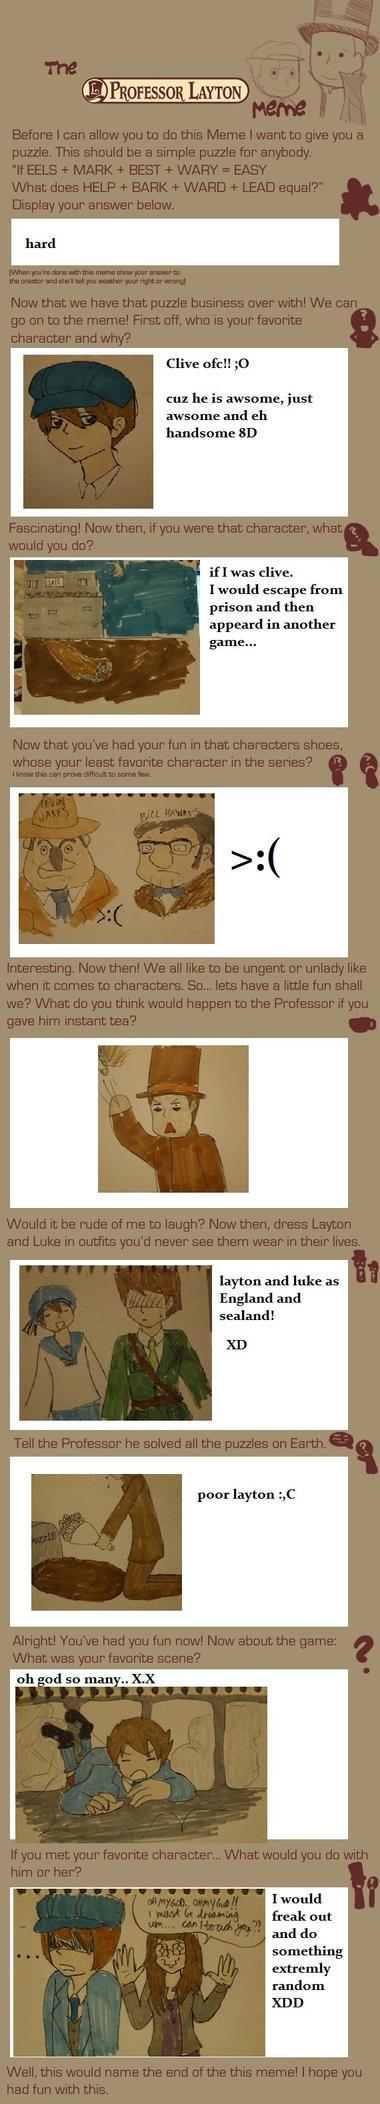 Professor Layton meme by Chibiklompen